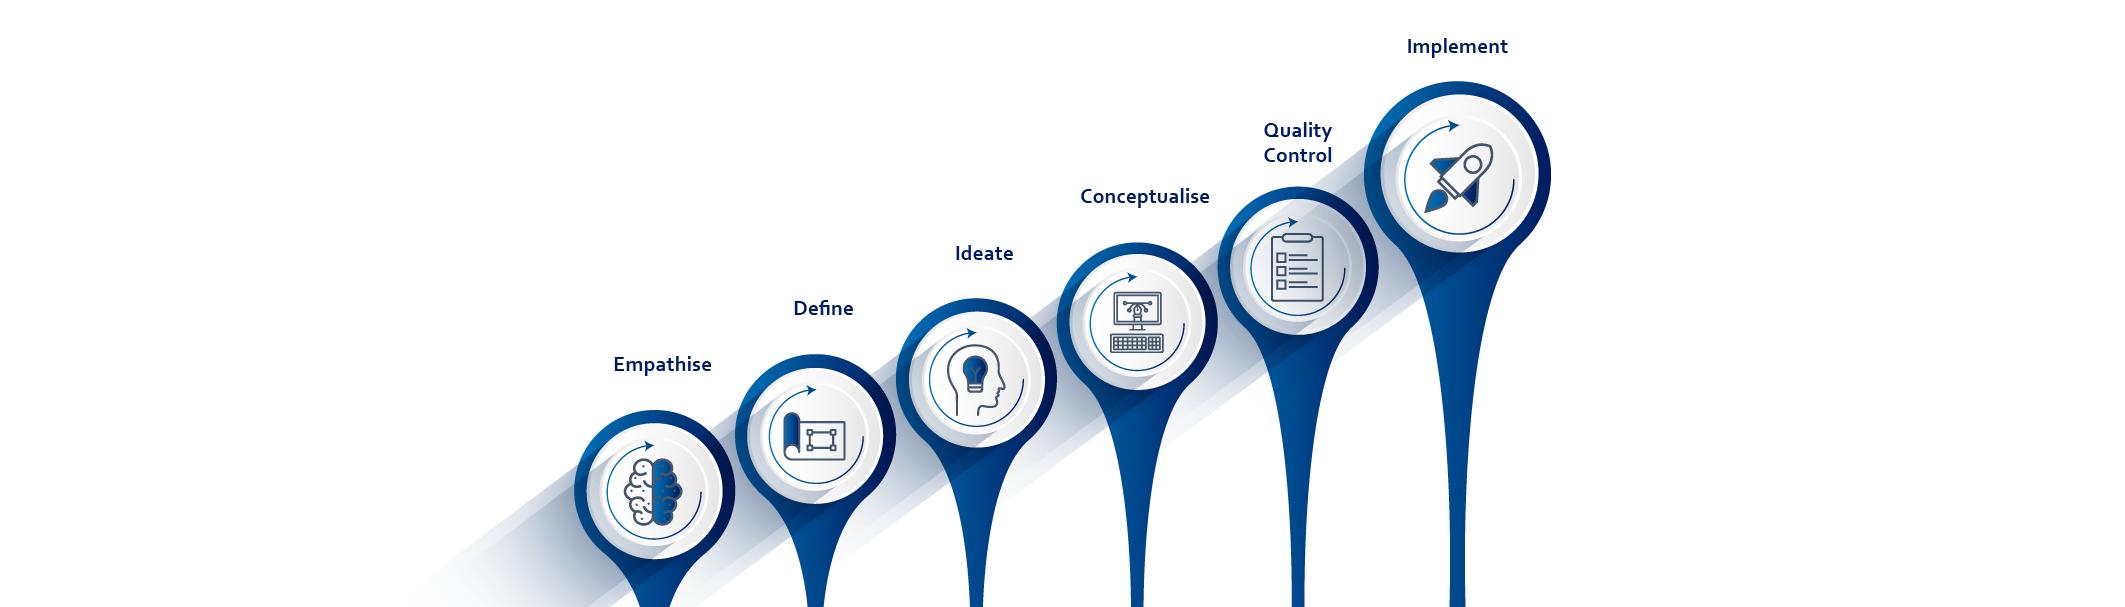 bluCube International Design Thinking infographic